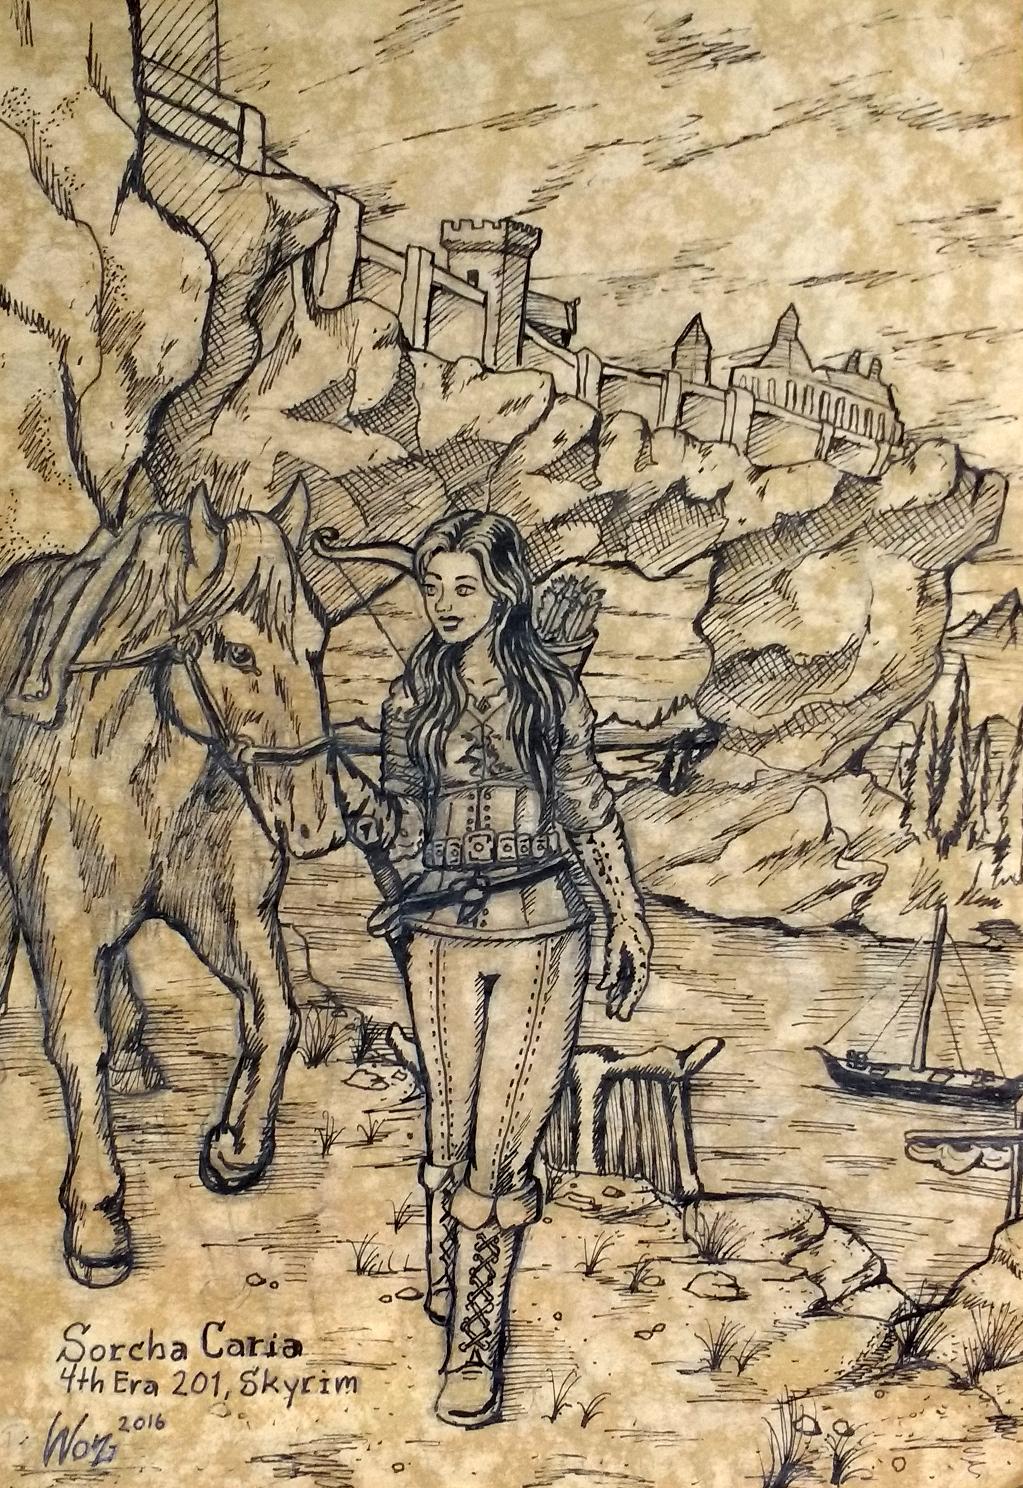 Sorcha Caria - Skyrim